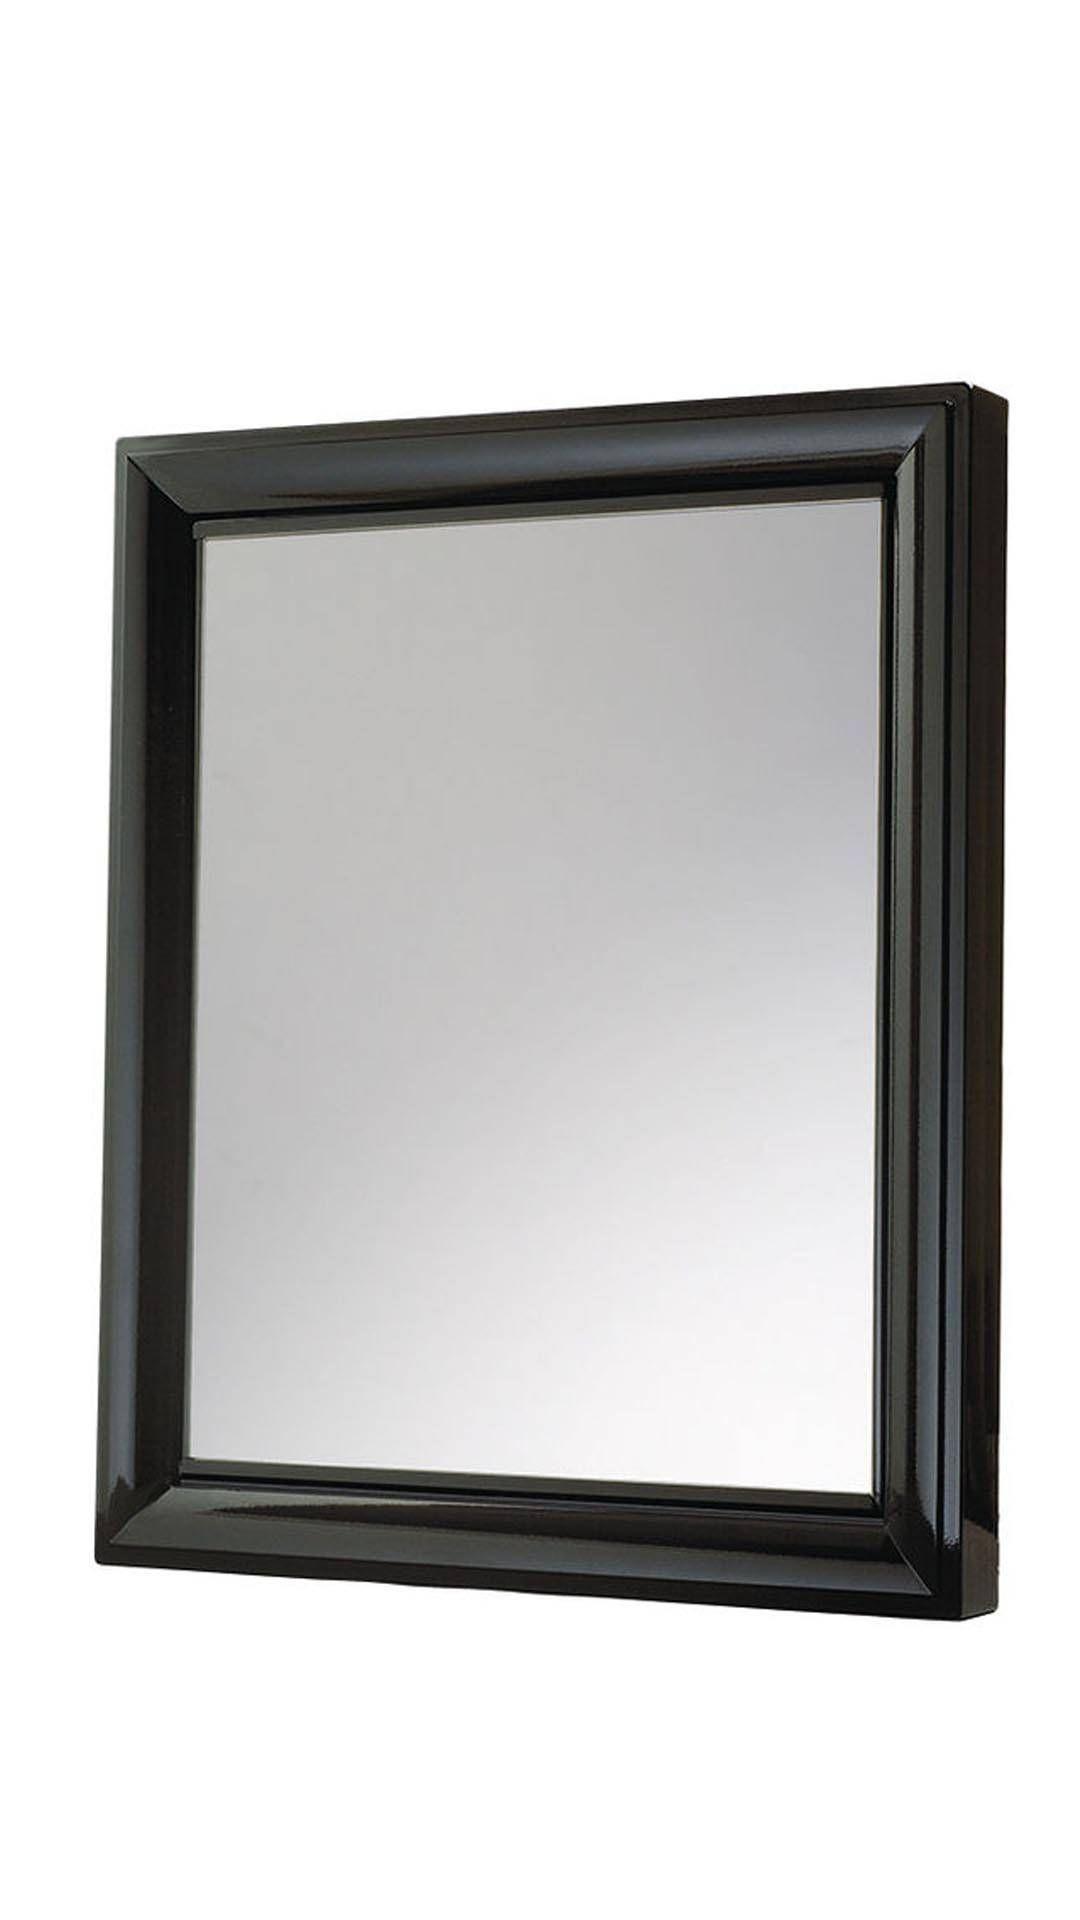 Bathroom Mirror Trends latest posts under: bathroom mirror cabinets   bathroom design